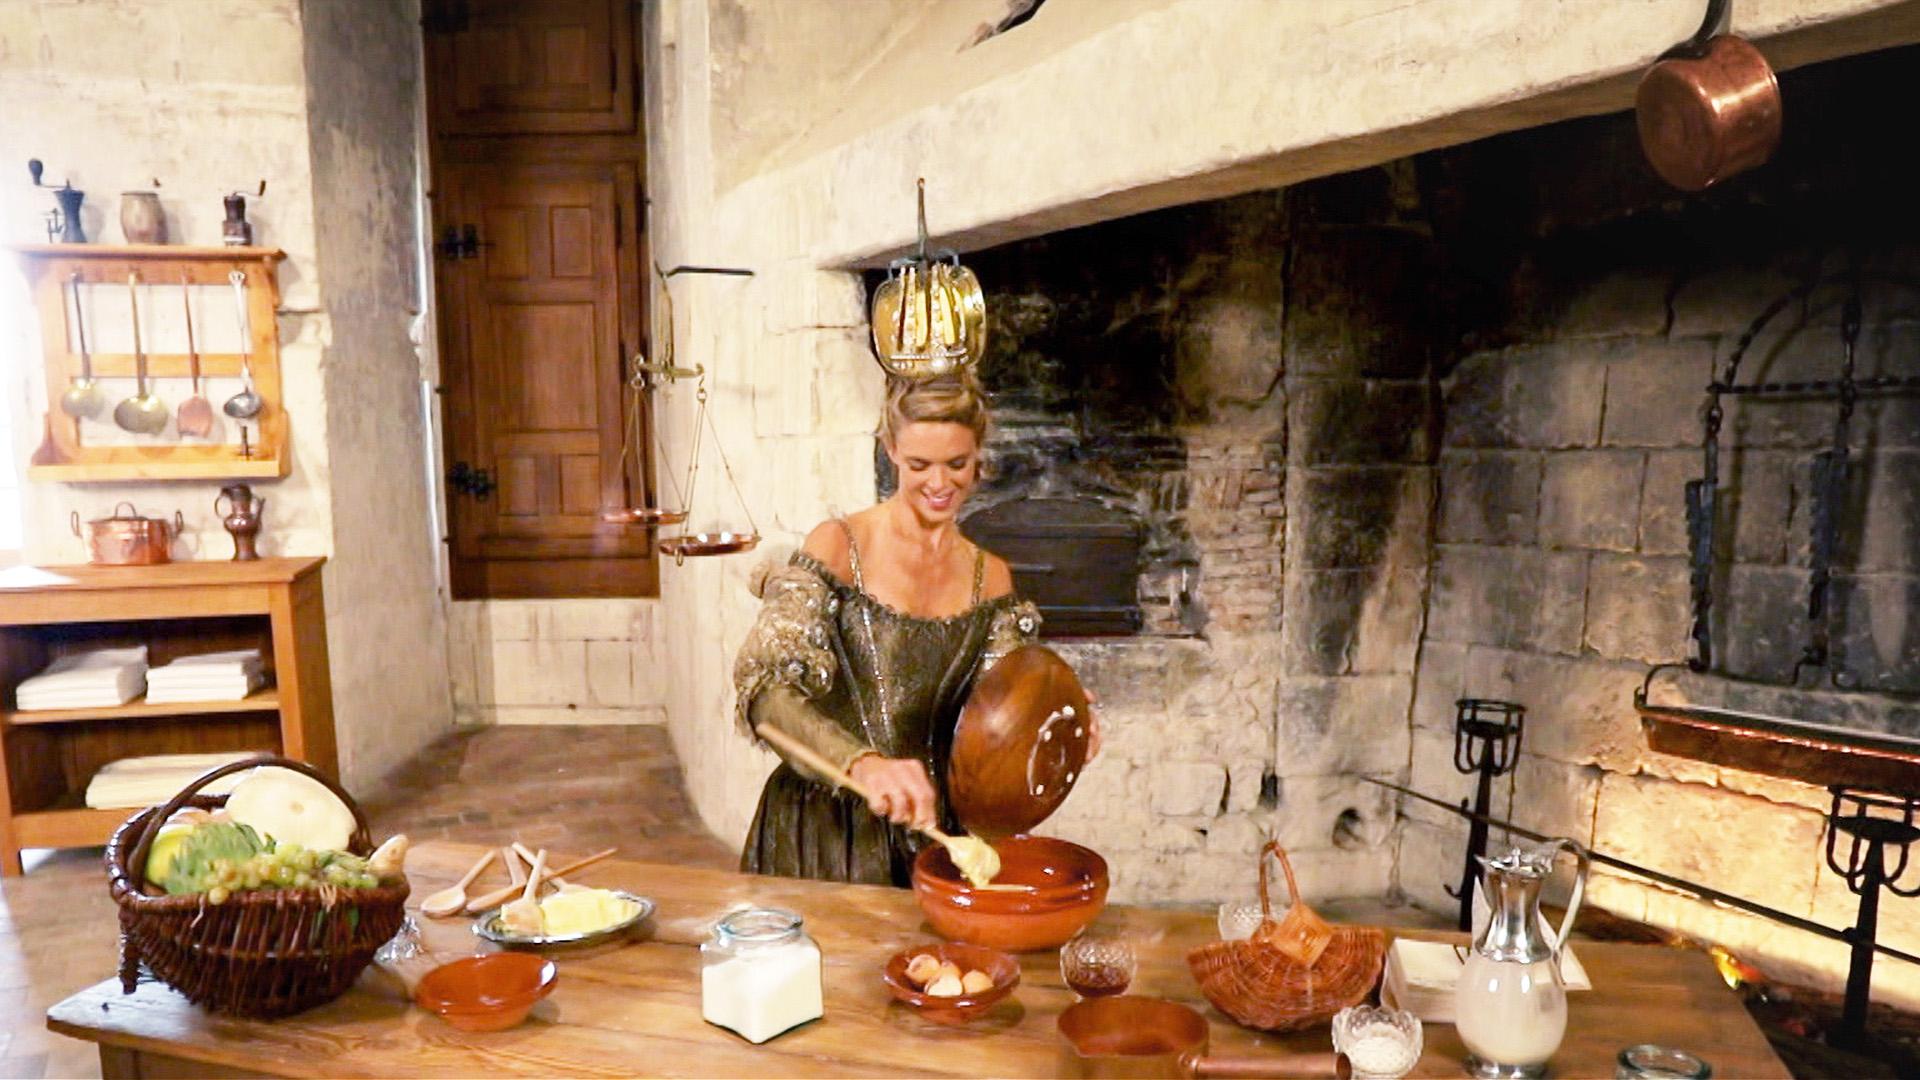 Francuskie wędrówki Julie. Renesansowa uczta na zamku Chambord